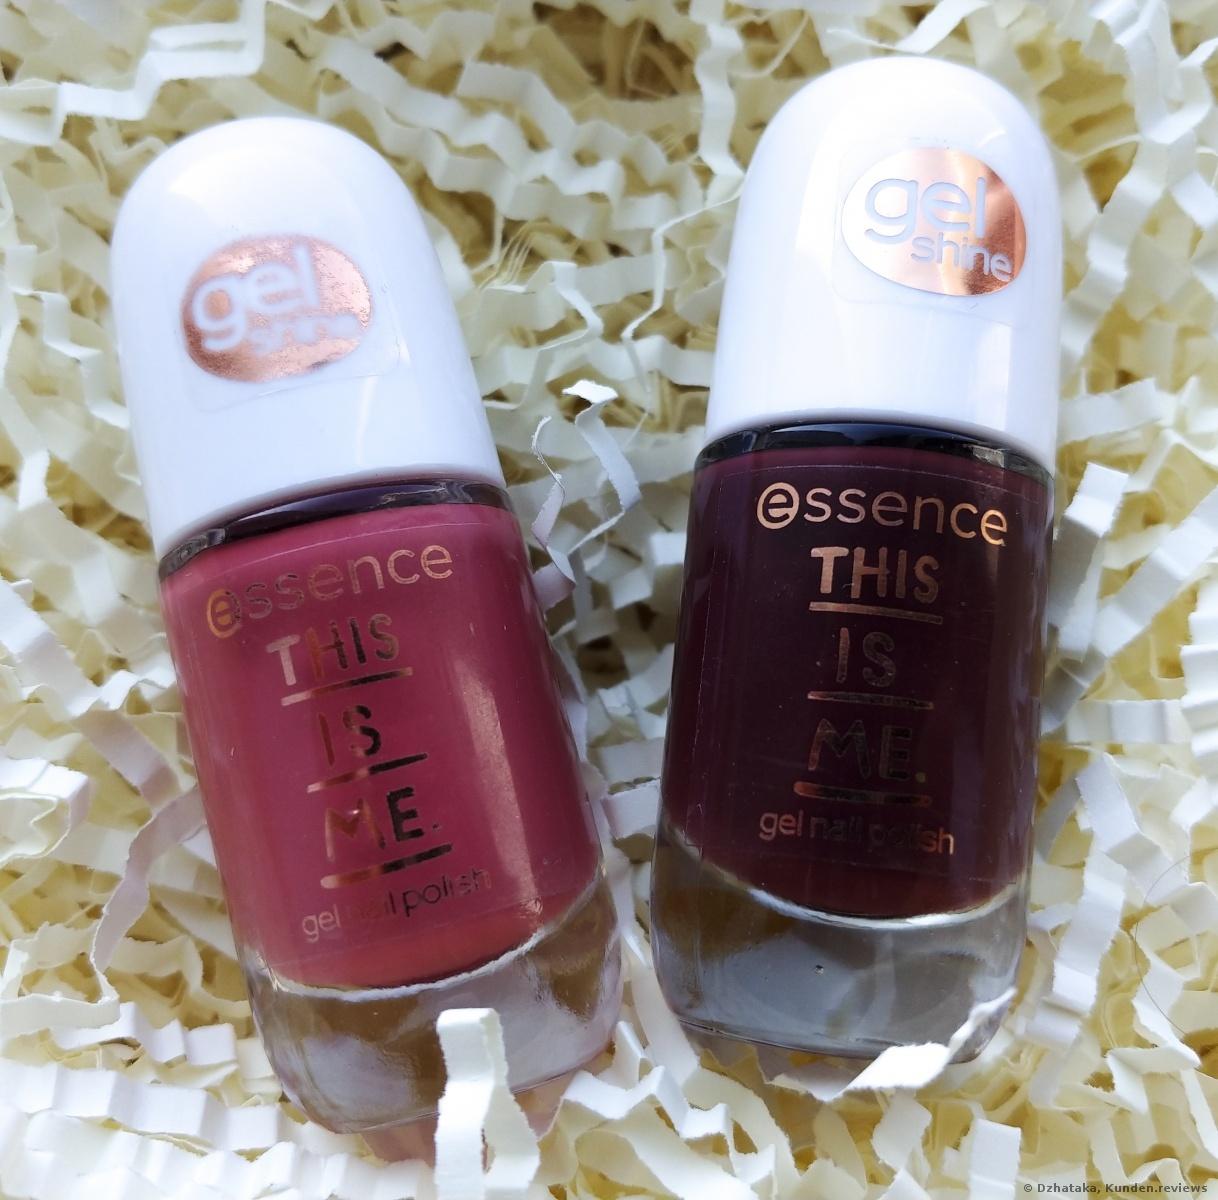 Essence This is Me gel nail polish